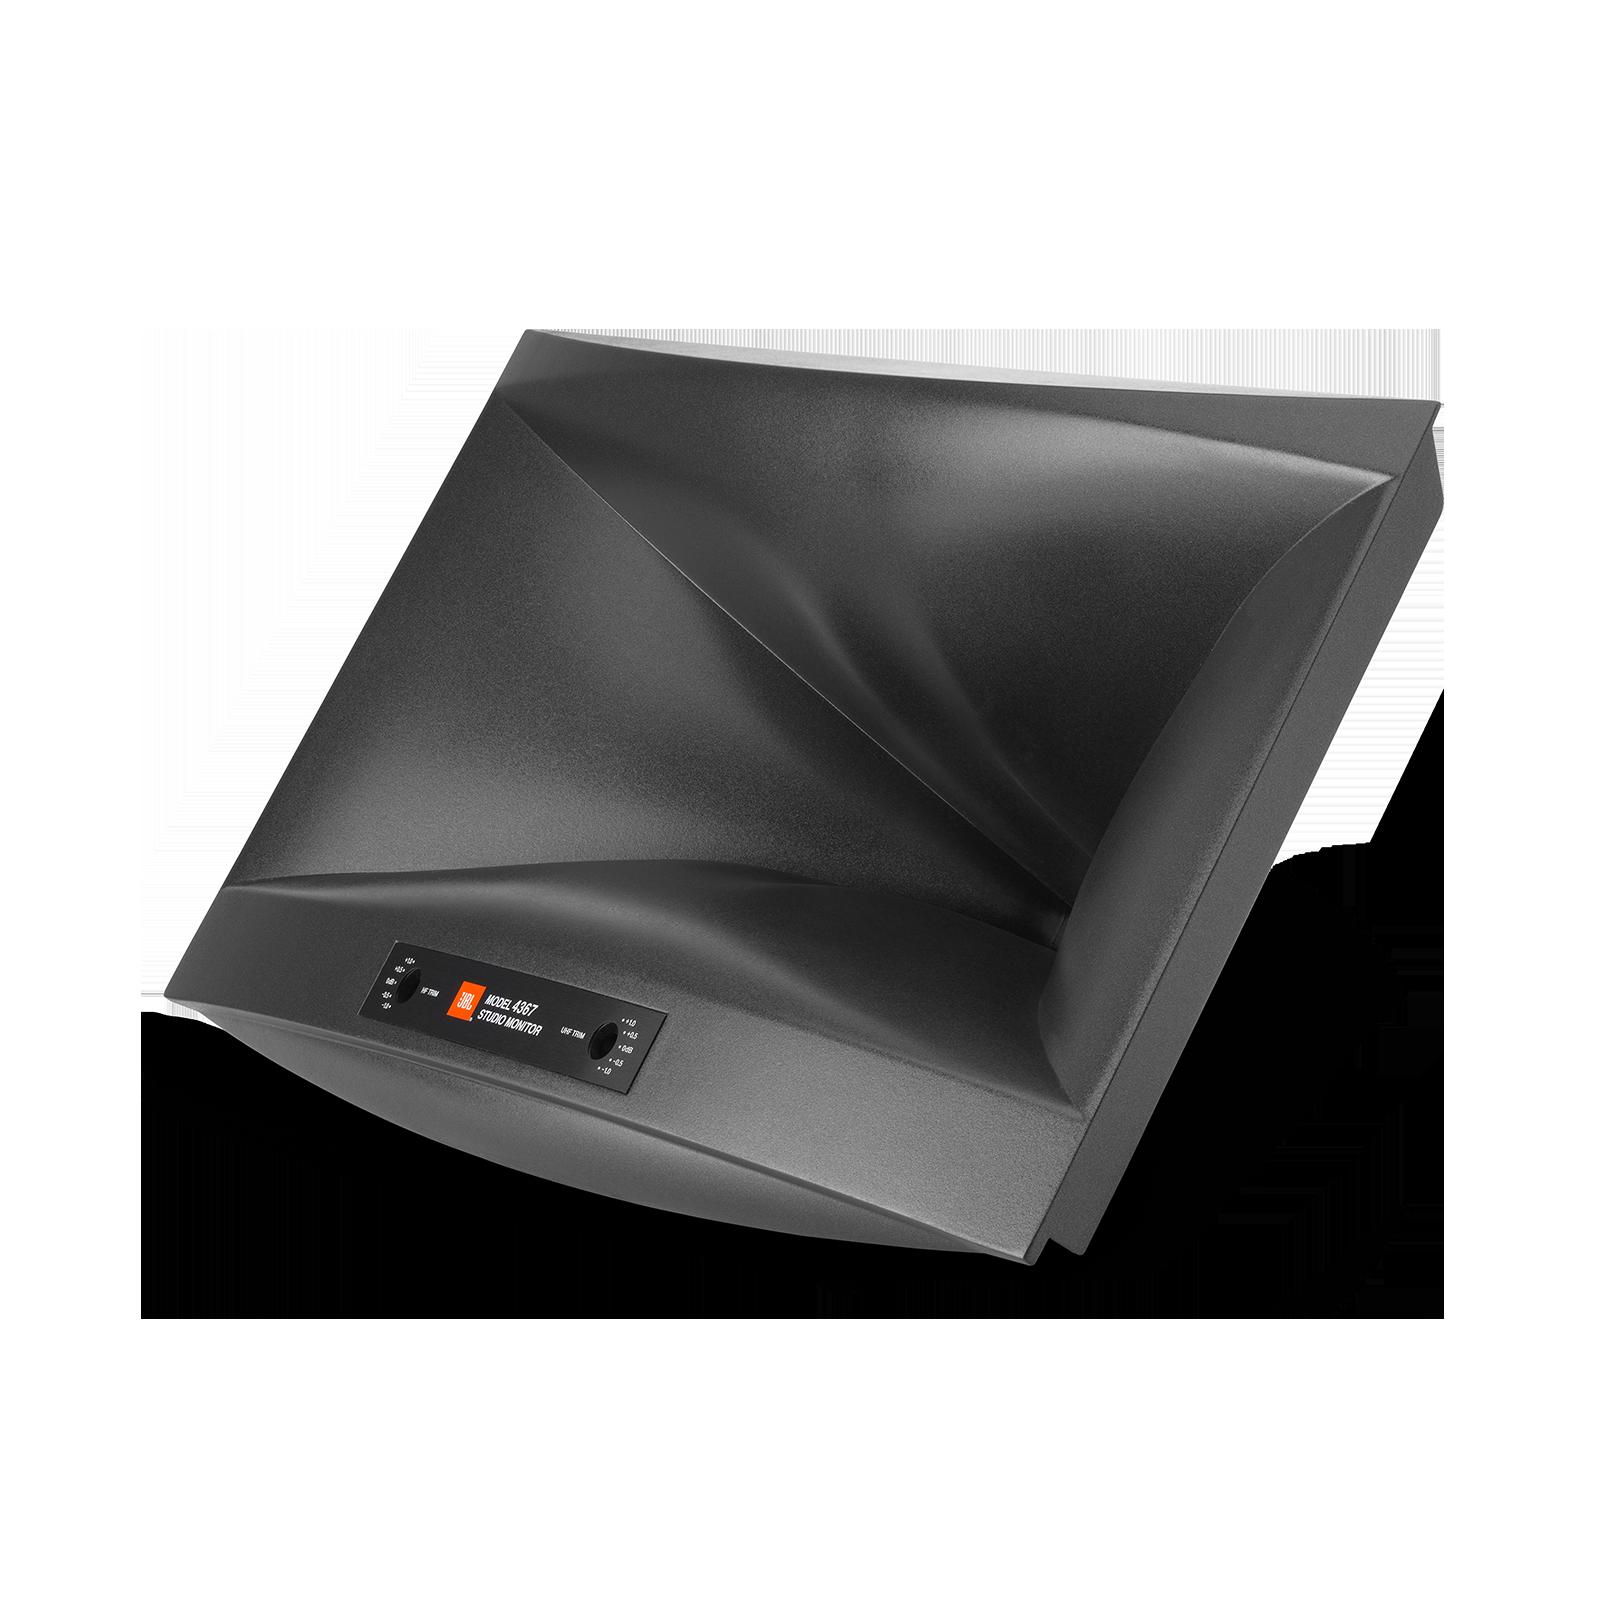 "4367 - Black - 15"" (380mm) 2-way Floorstanding Studio Monitor Loudspeaker - Detailshot 1"